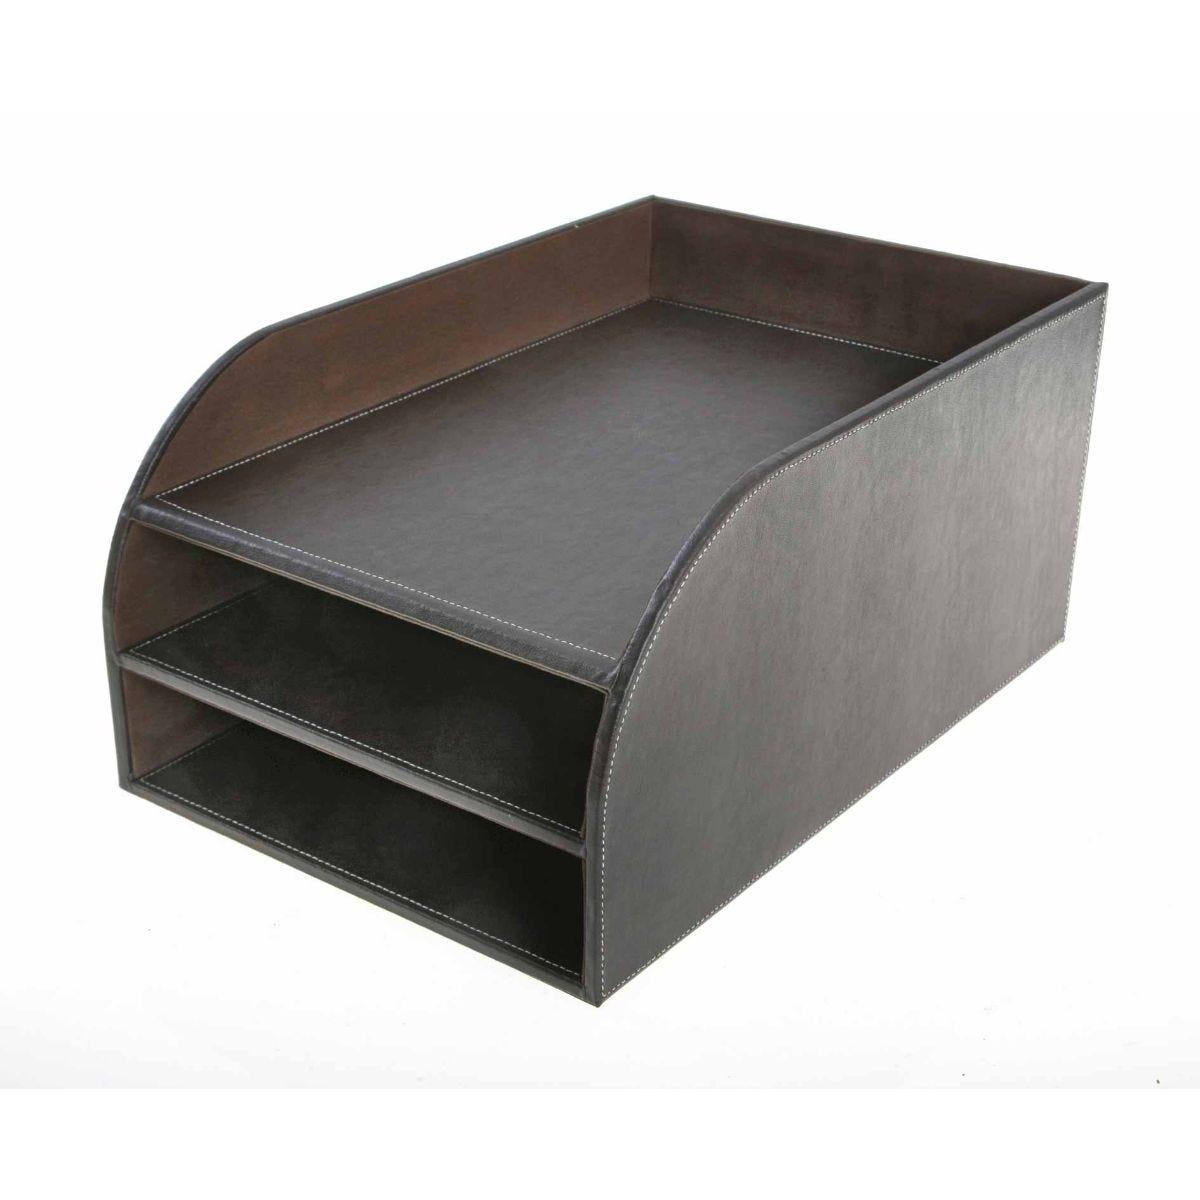 Letter Trays Desk Organisers U0026 Storage Desk Accessories Office Supplies    Ryman